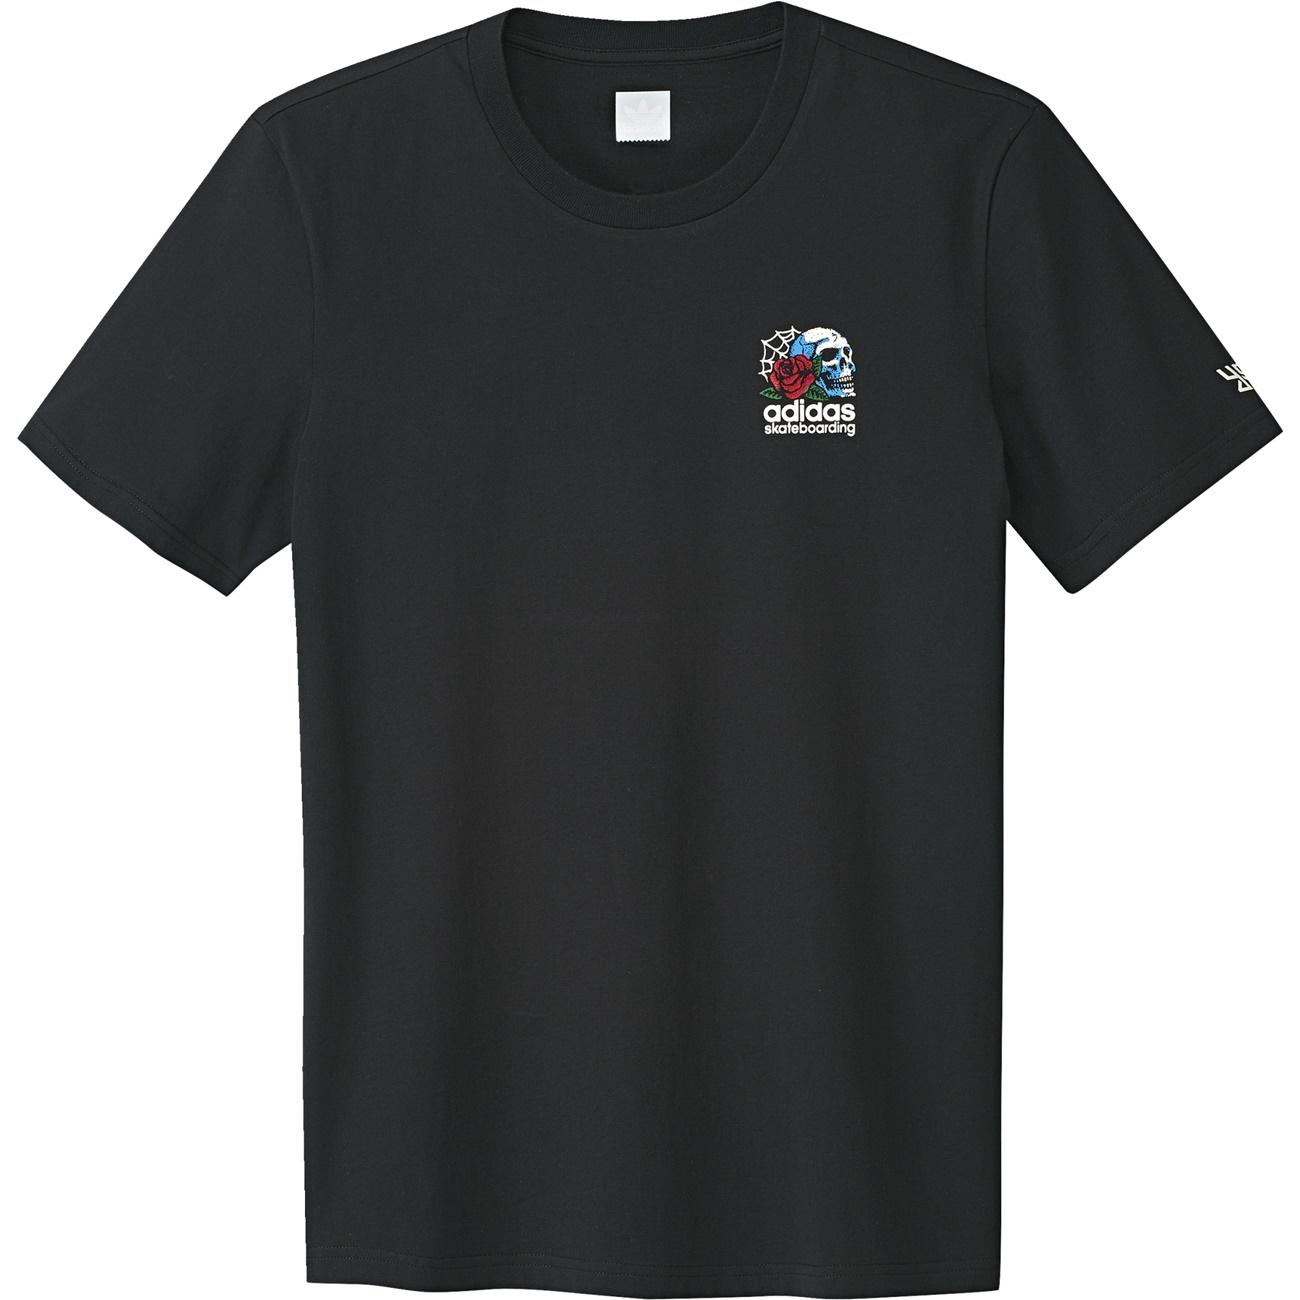 Originals Shackles Adidas T Skaters Shirtblack y6YIvbf7g